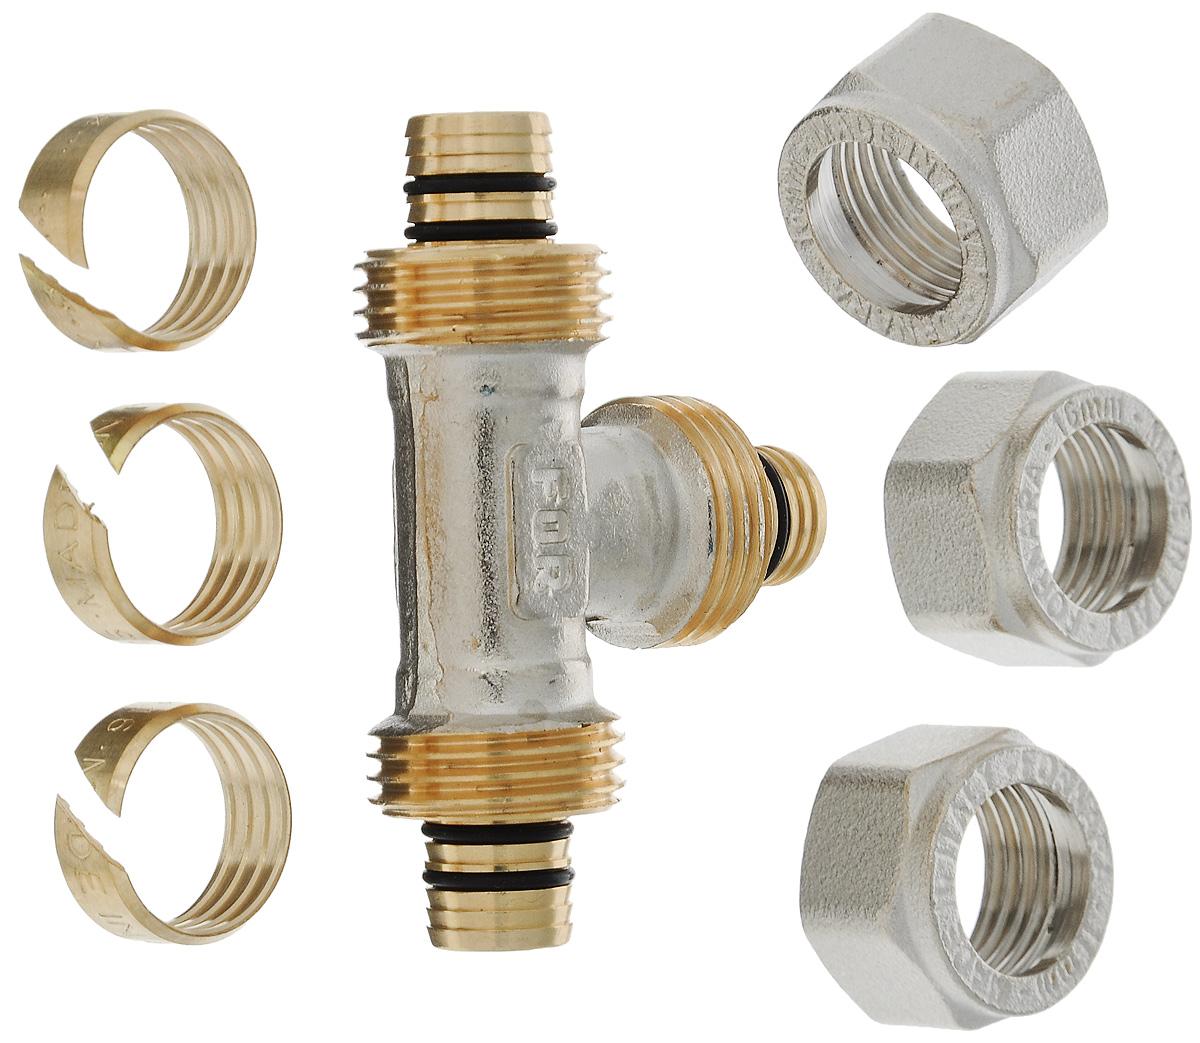 Тройник Fornara, ц - ц - ц, 16 х 2,0 тройник с выключателем